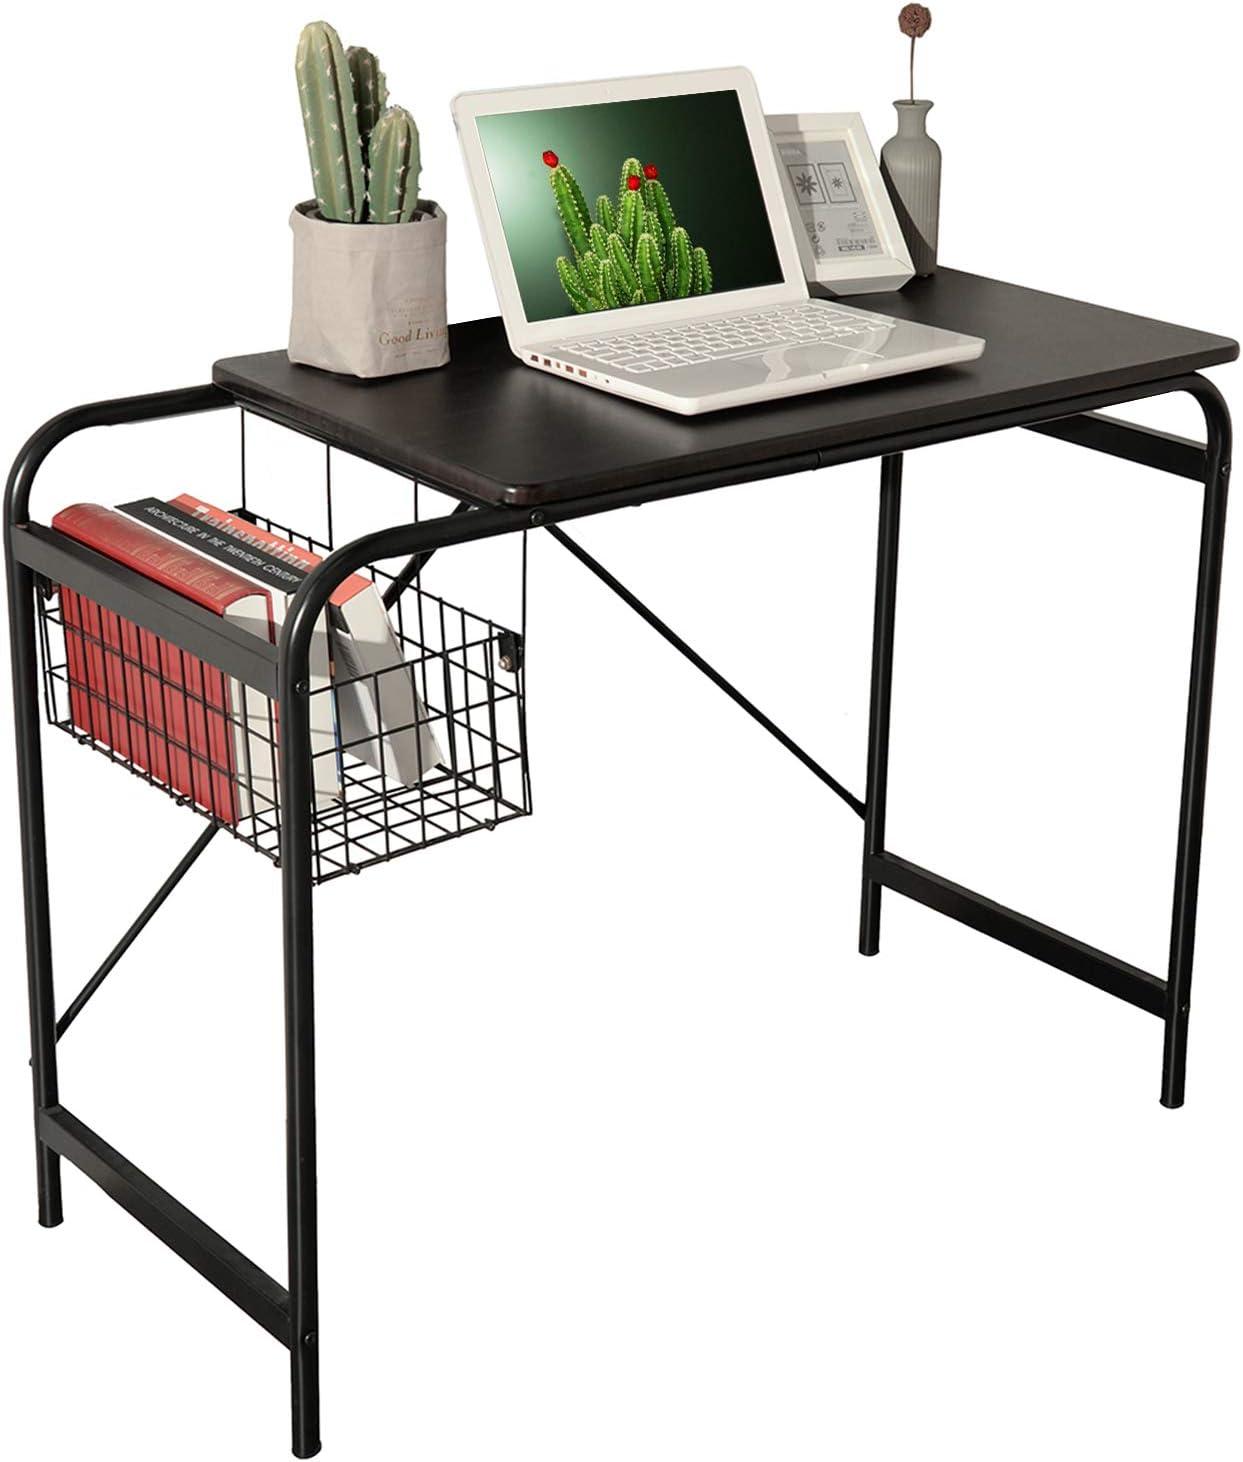 Computer Writing Desk with Metal Storage Basket Industrial Modern Simple Laptop Desk Wooden Study Workstation Space Saving Table Ideal for Home Office Dormitory Brown Desktop Black Fram